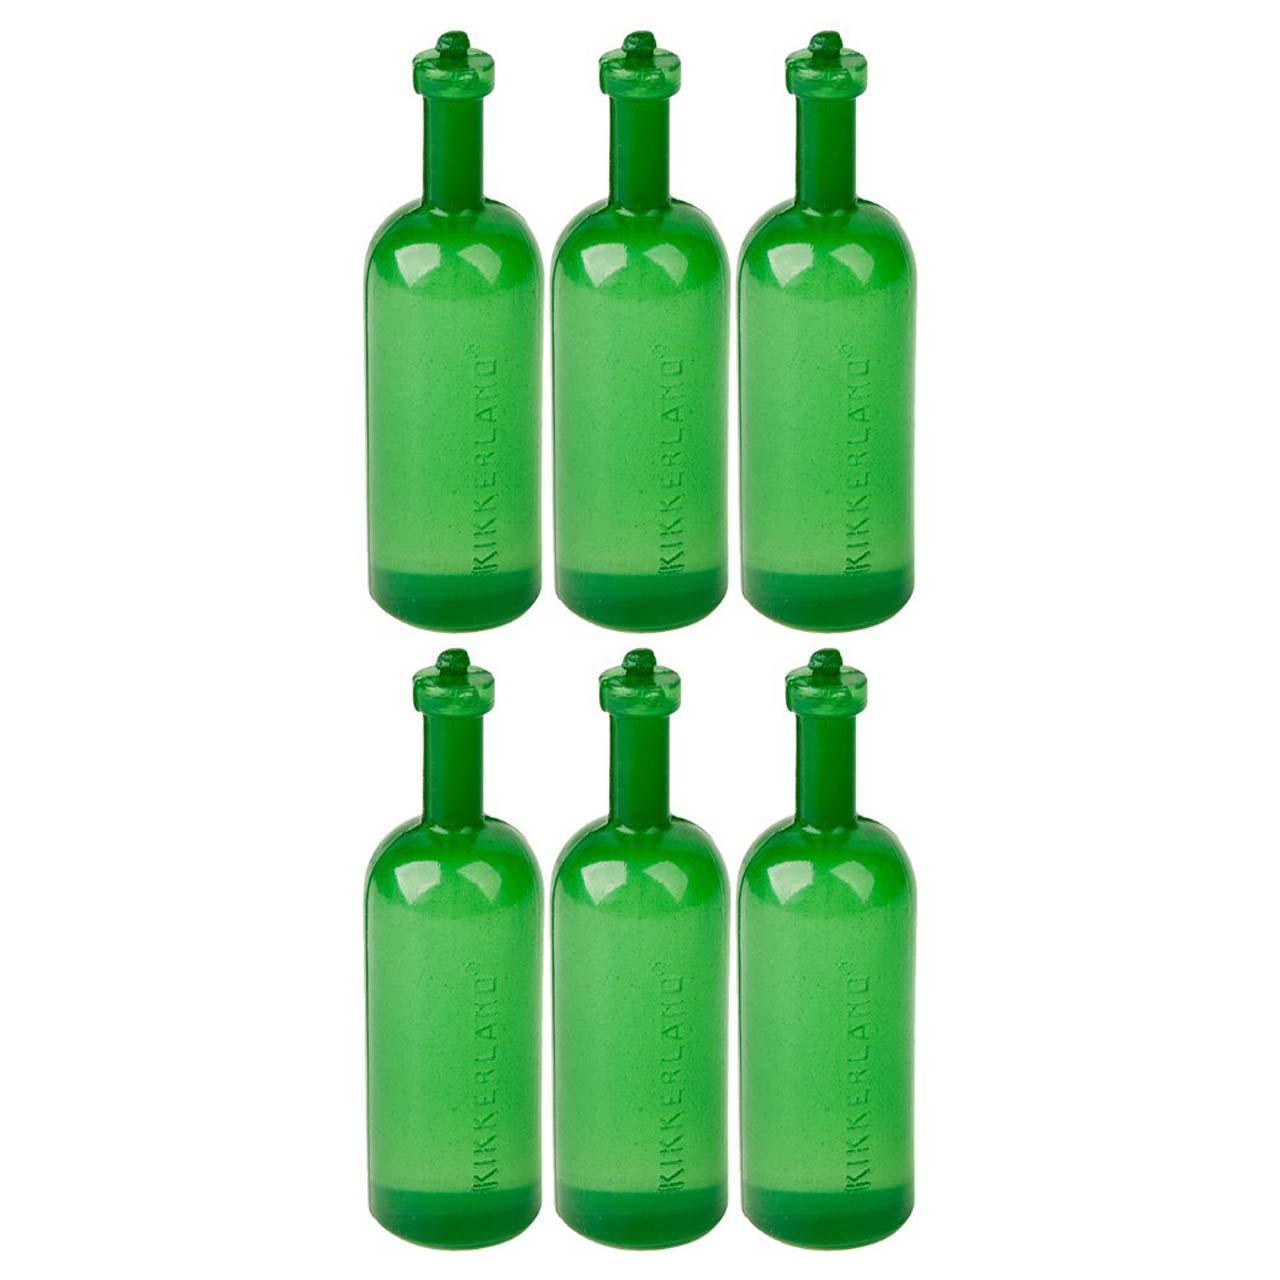 قالب یخ کیکرلند مدل Bottle بسته 6 عددی